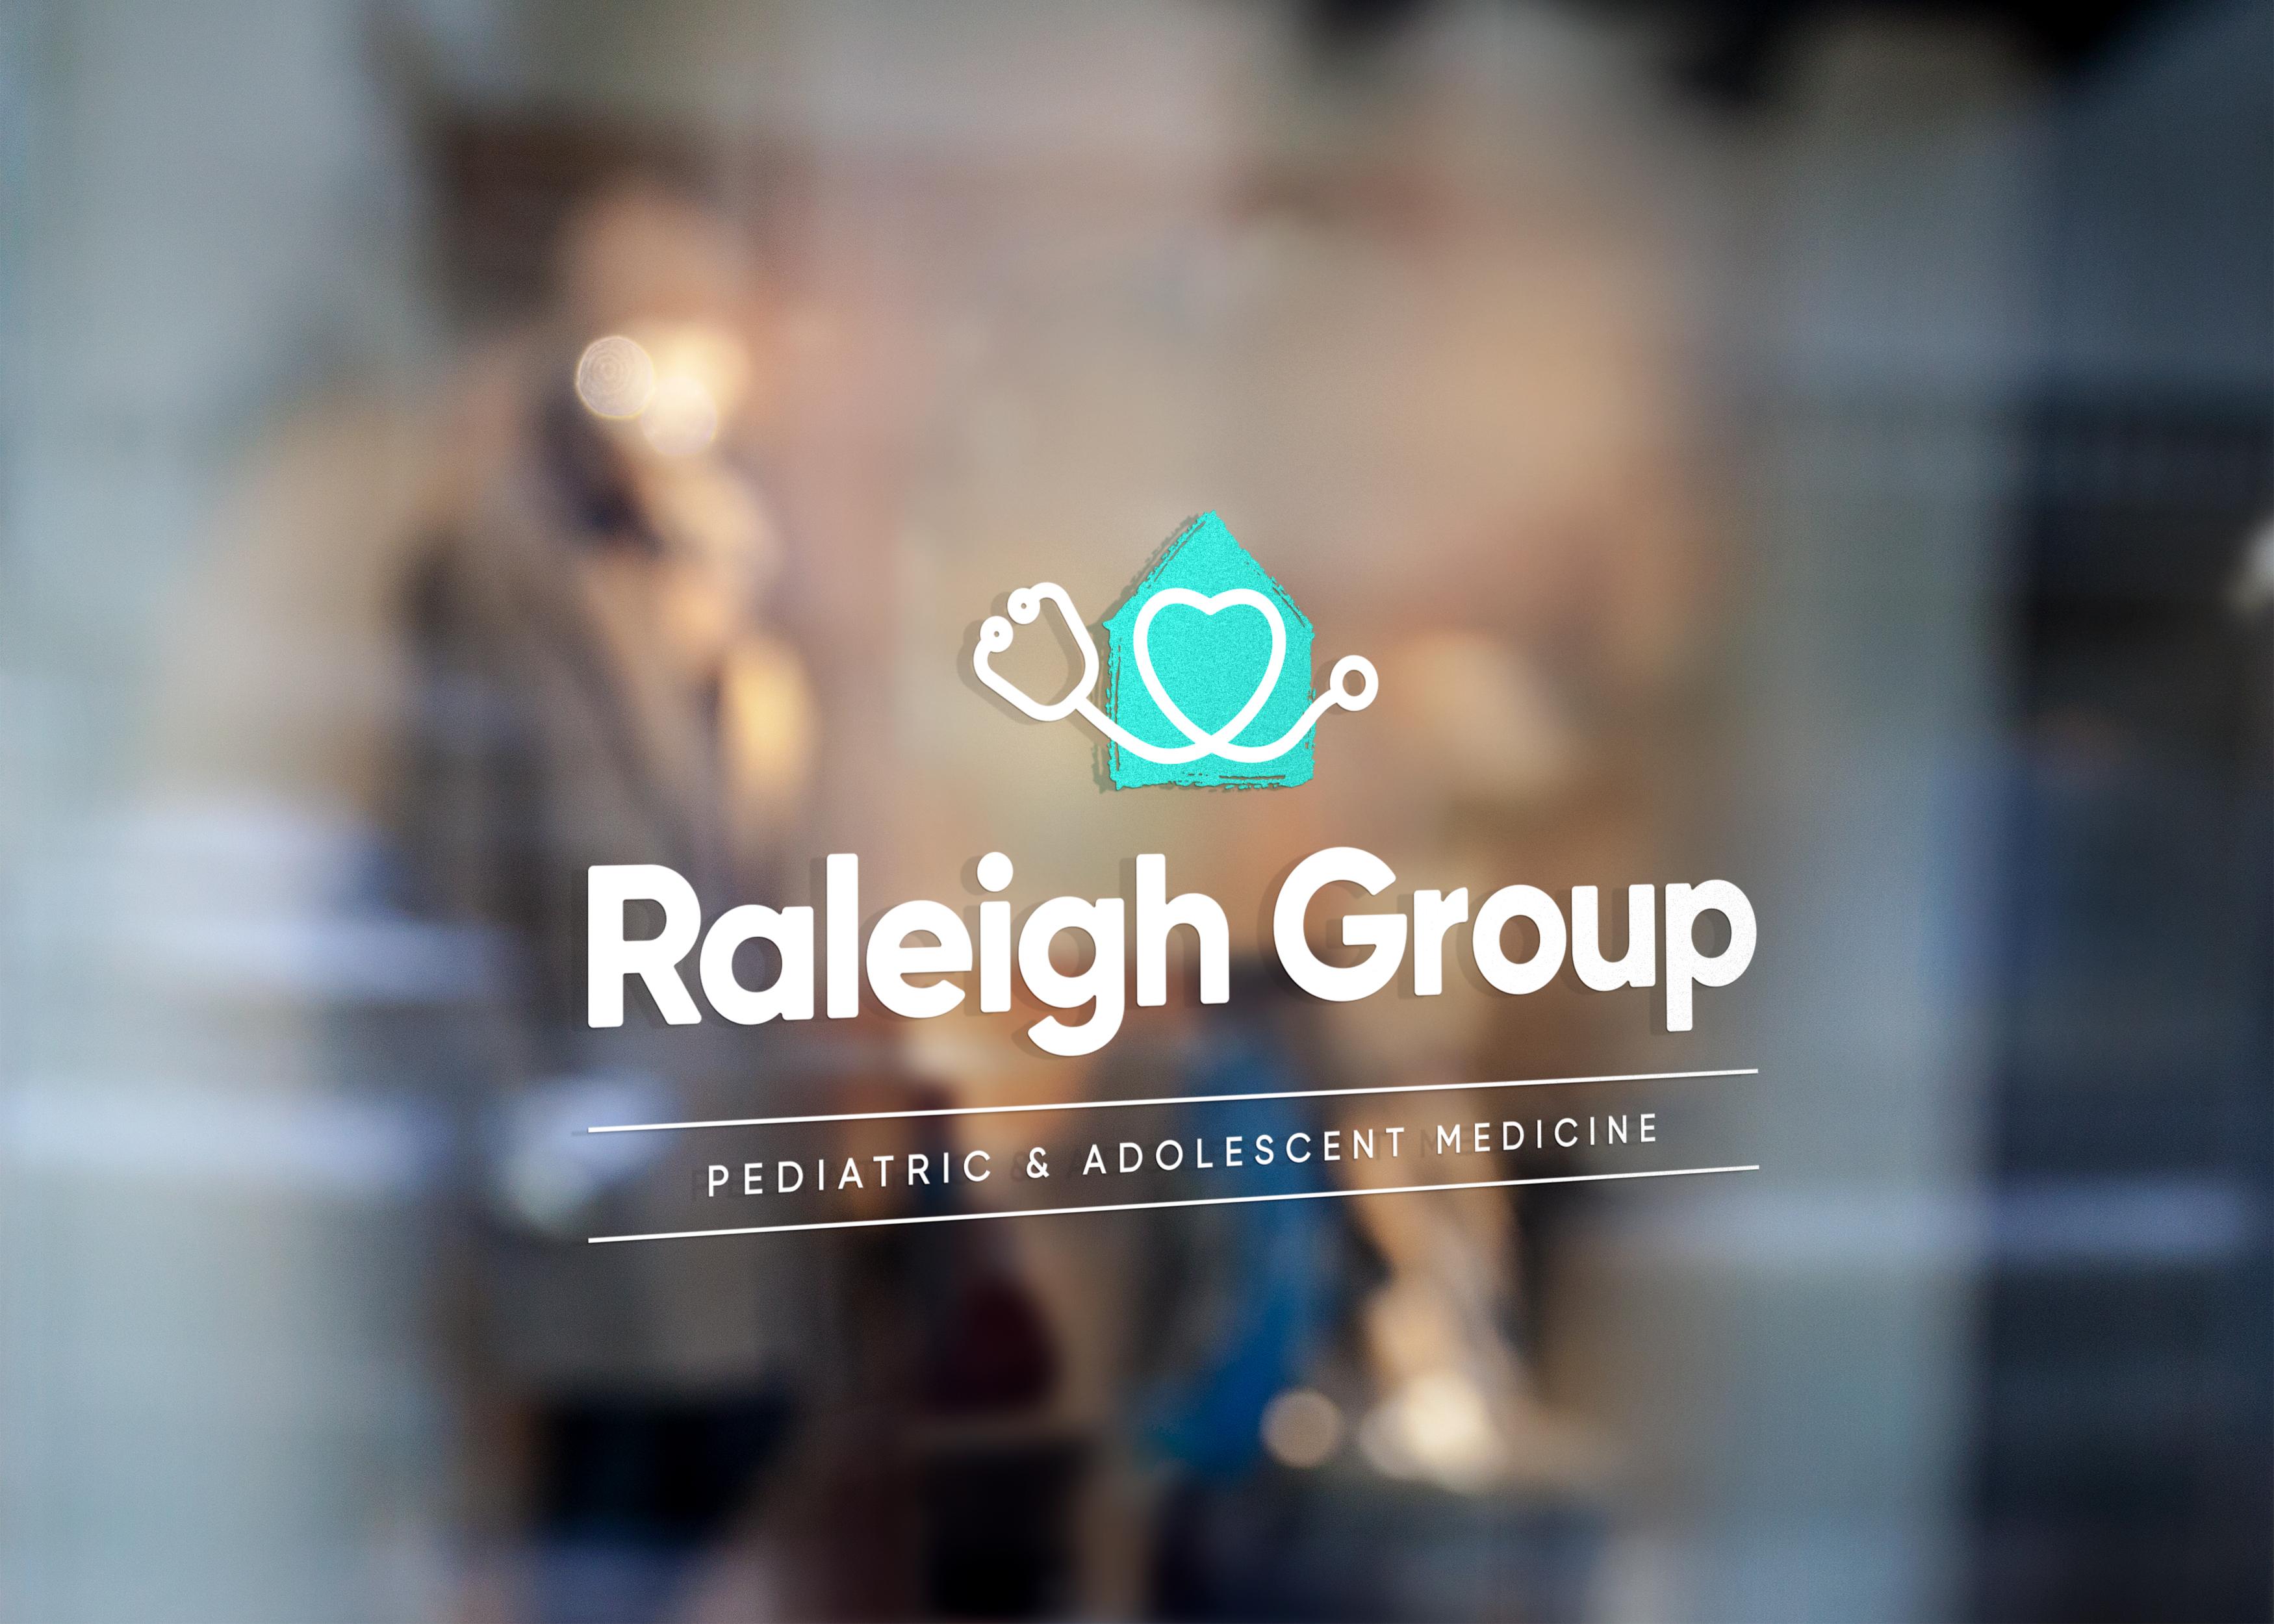 Raleigh group logo on window